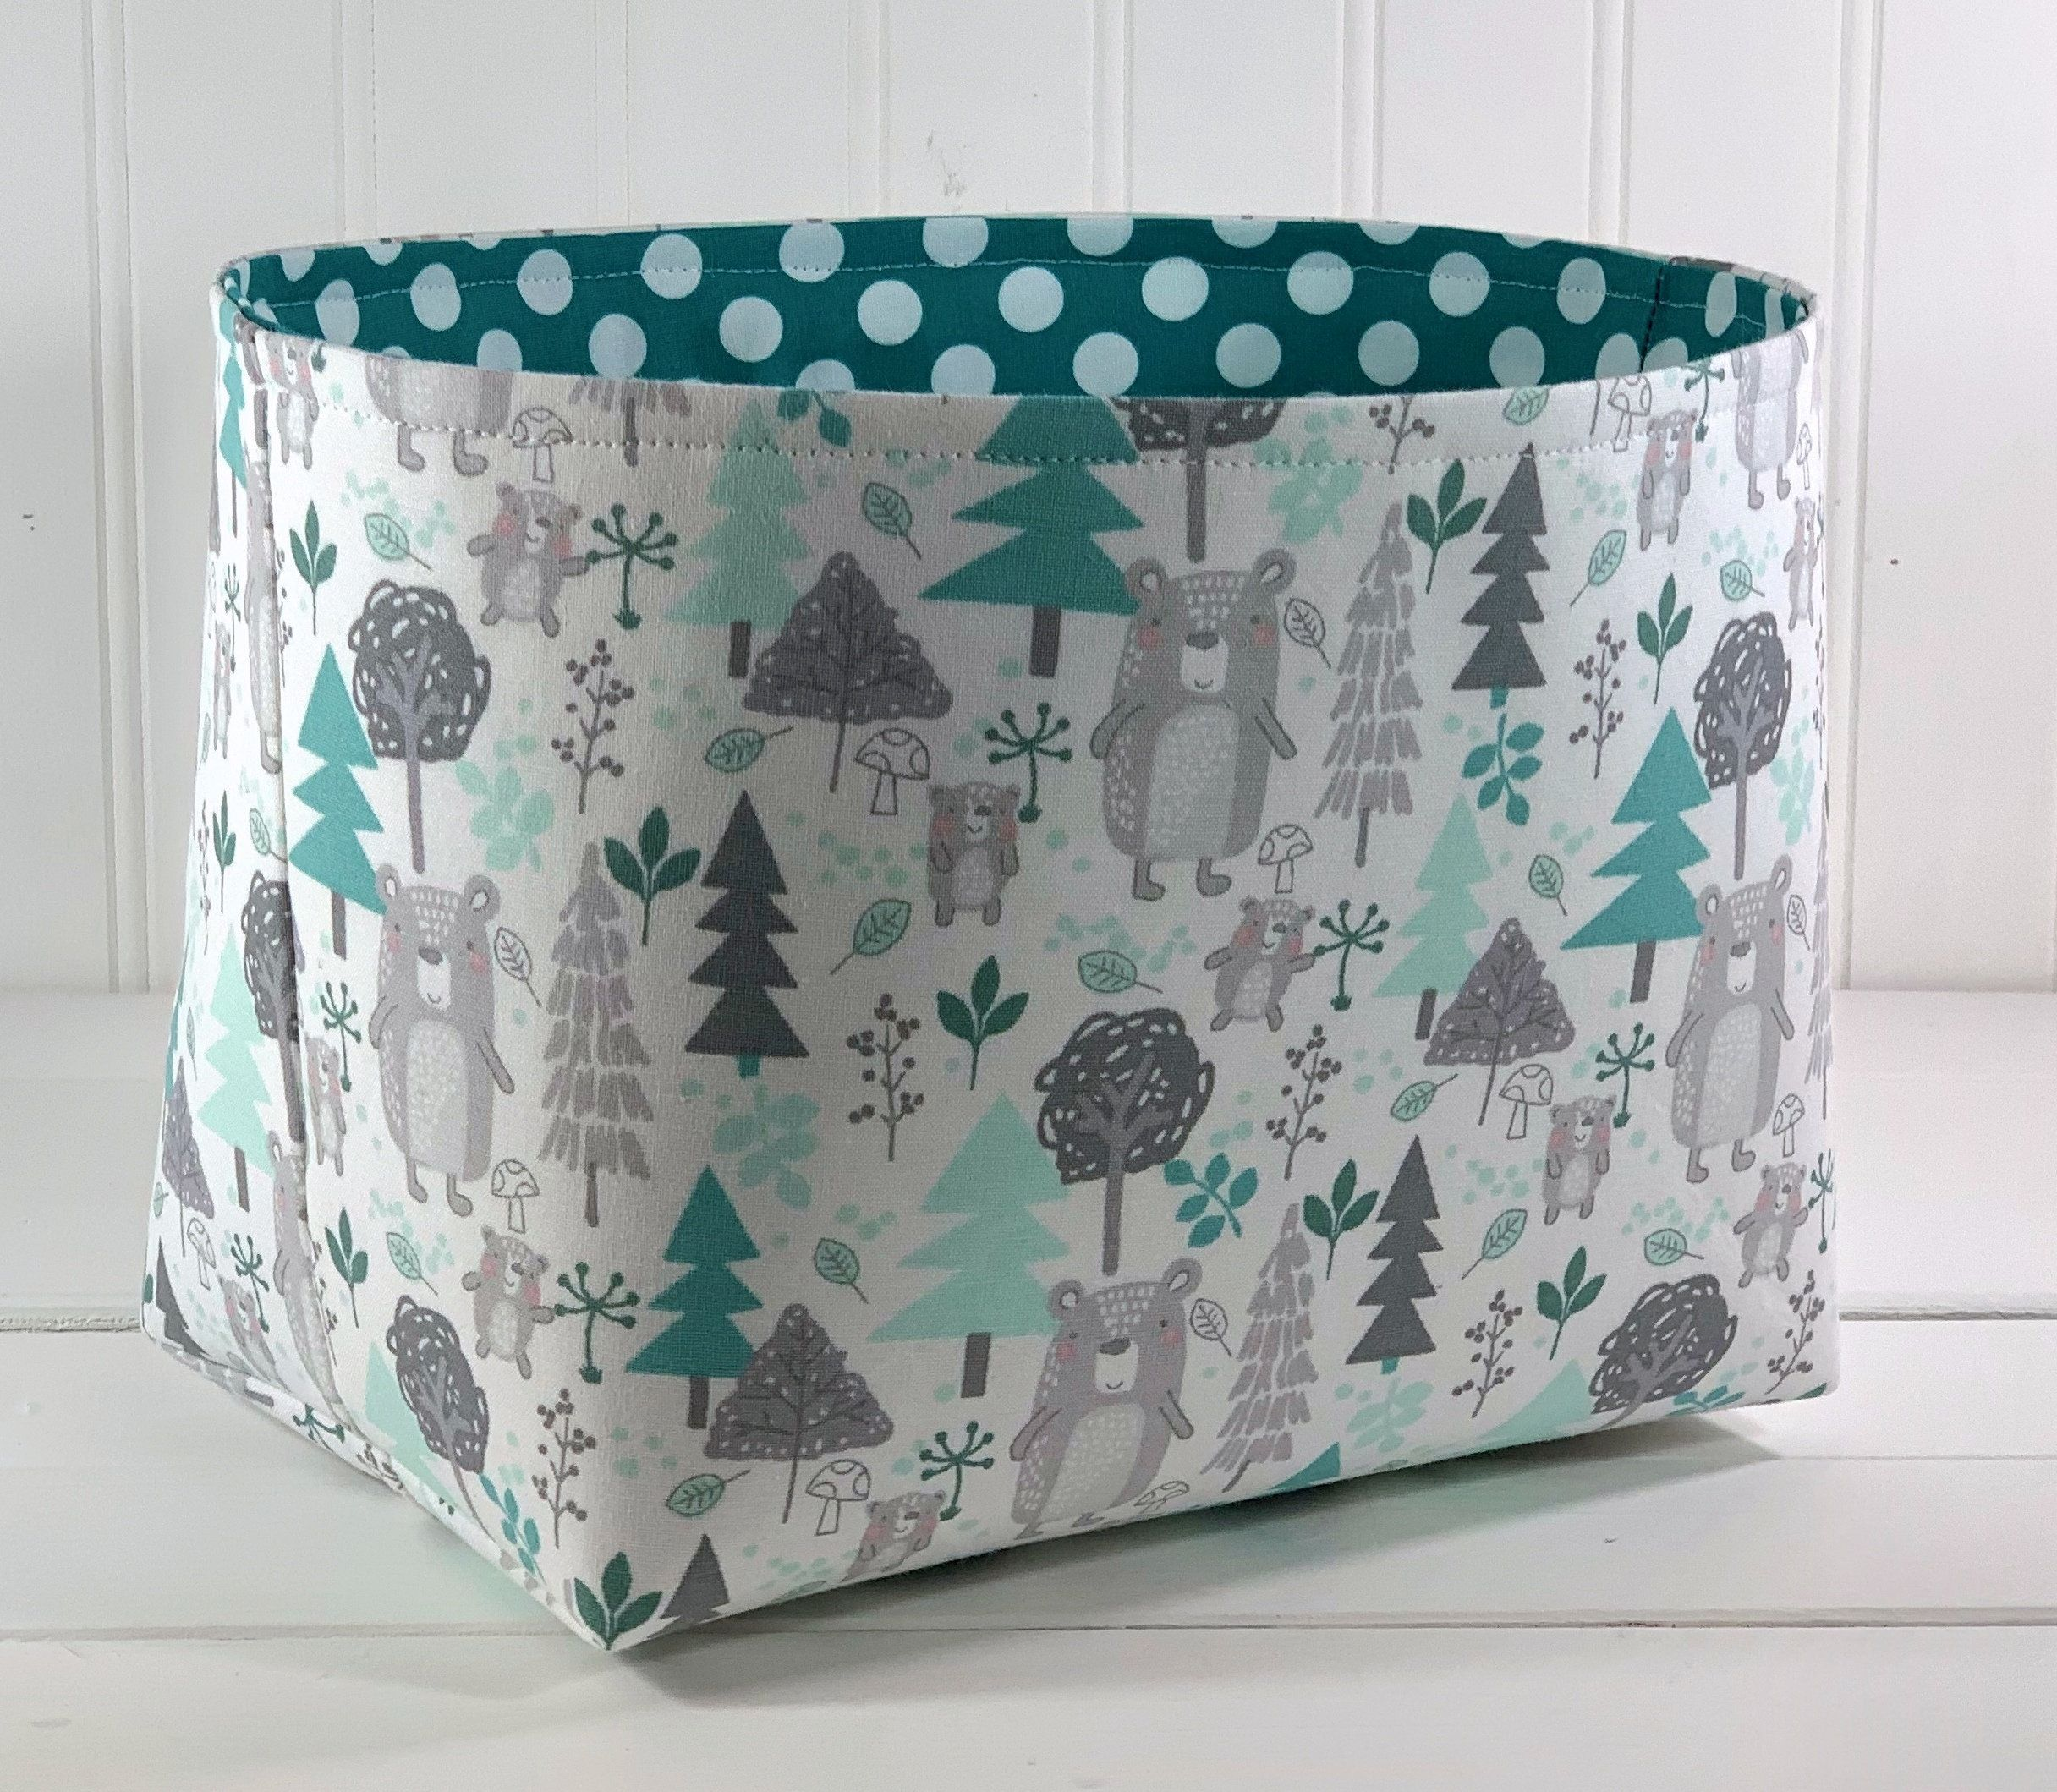 Woodland Nursery Storage Basket, Bear Nursery Decor, Fabric Organizer Bin - Woodland Bears Forest#basket #bear #bears #bin #decor #fabric #forest #nursery #organizer #storage #woodland